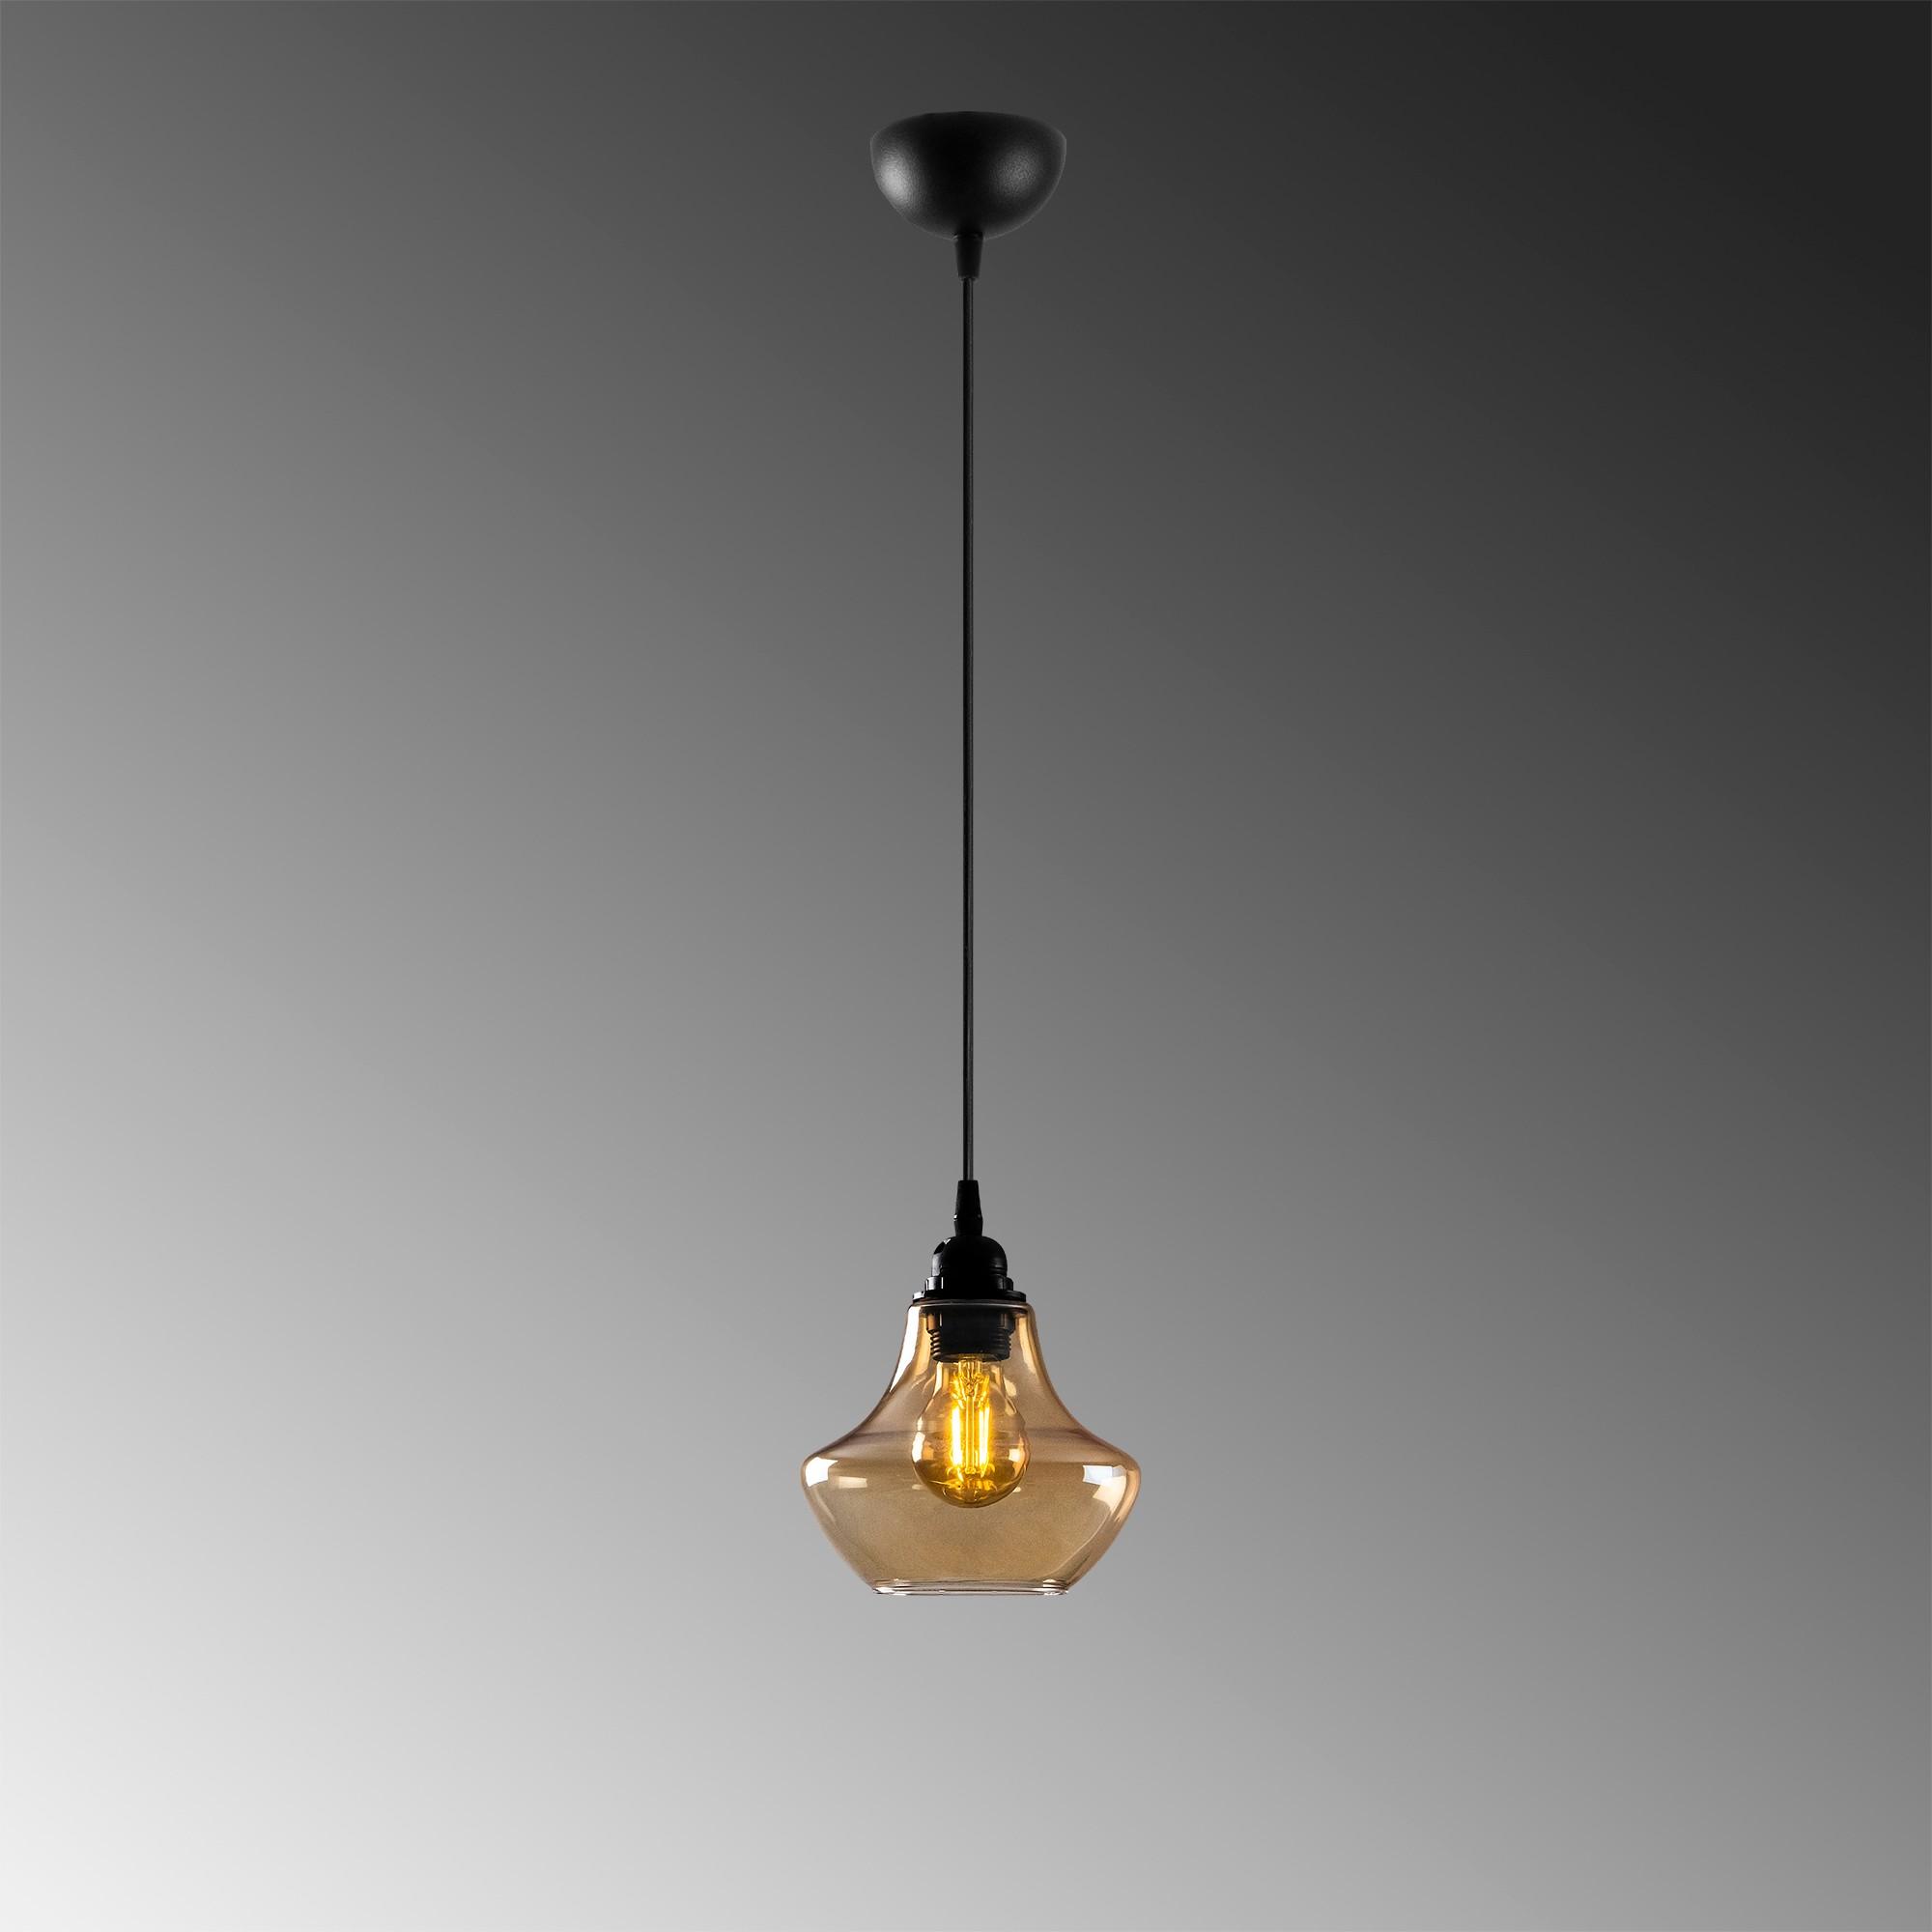 gouden hanglamp e27 fitting-Moroni -grijze achtergrond